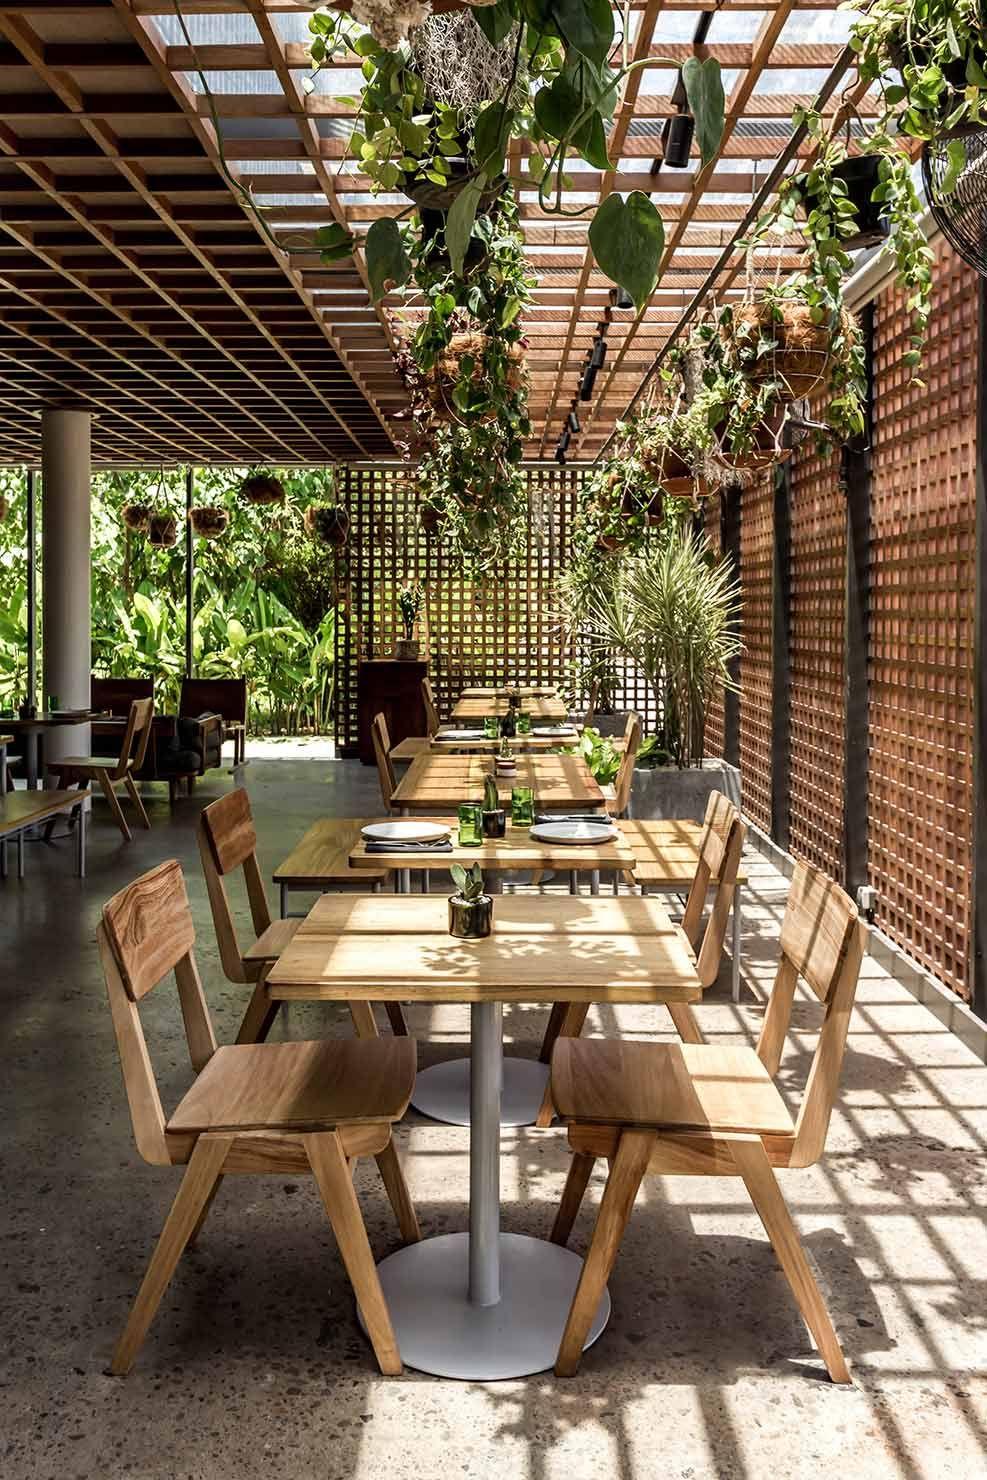 Bali Interiors Outdoor Restaurant Design Outdoor Restaurant Patio Outdoor Restaurant